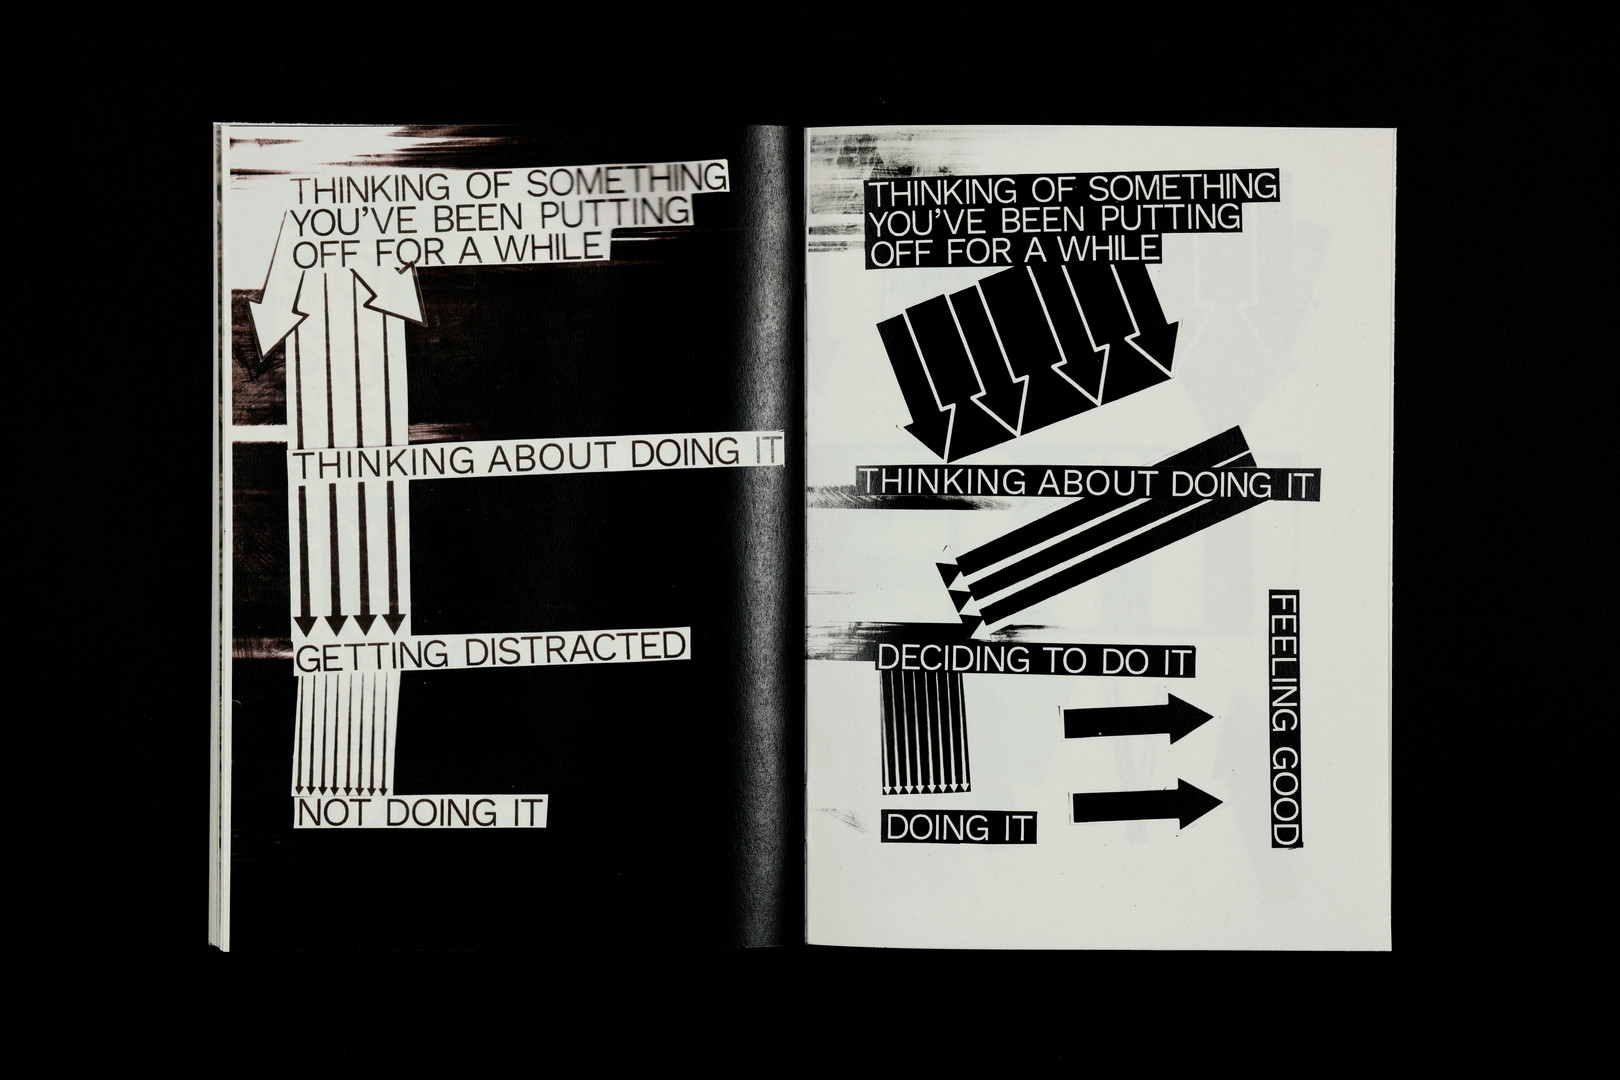 Procastination-Book-Mock-up_18.jpg